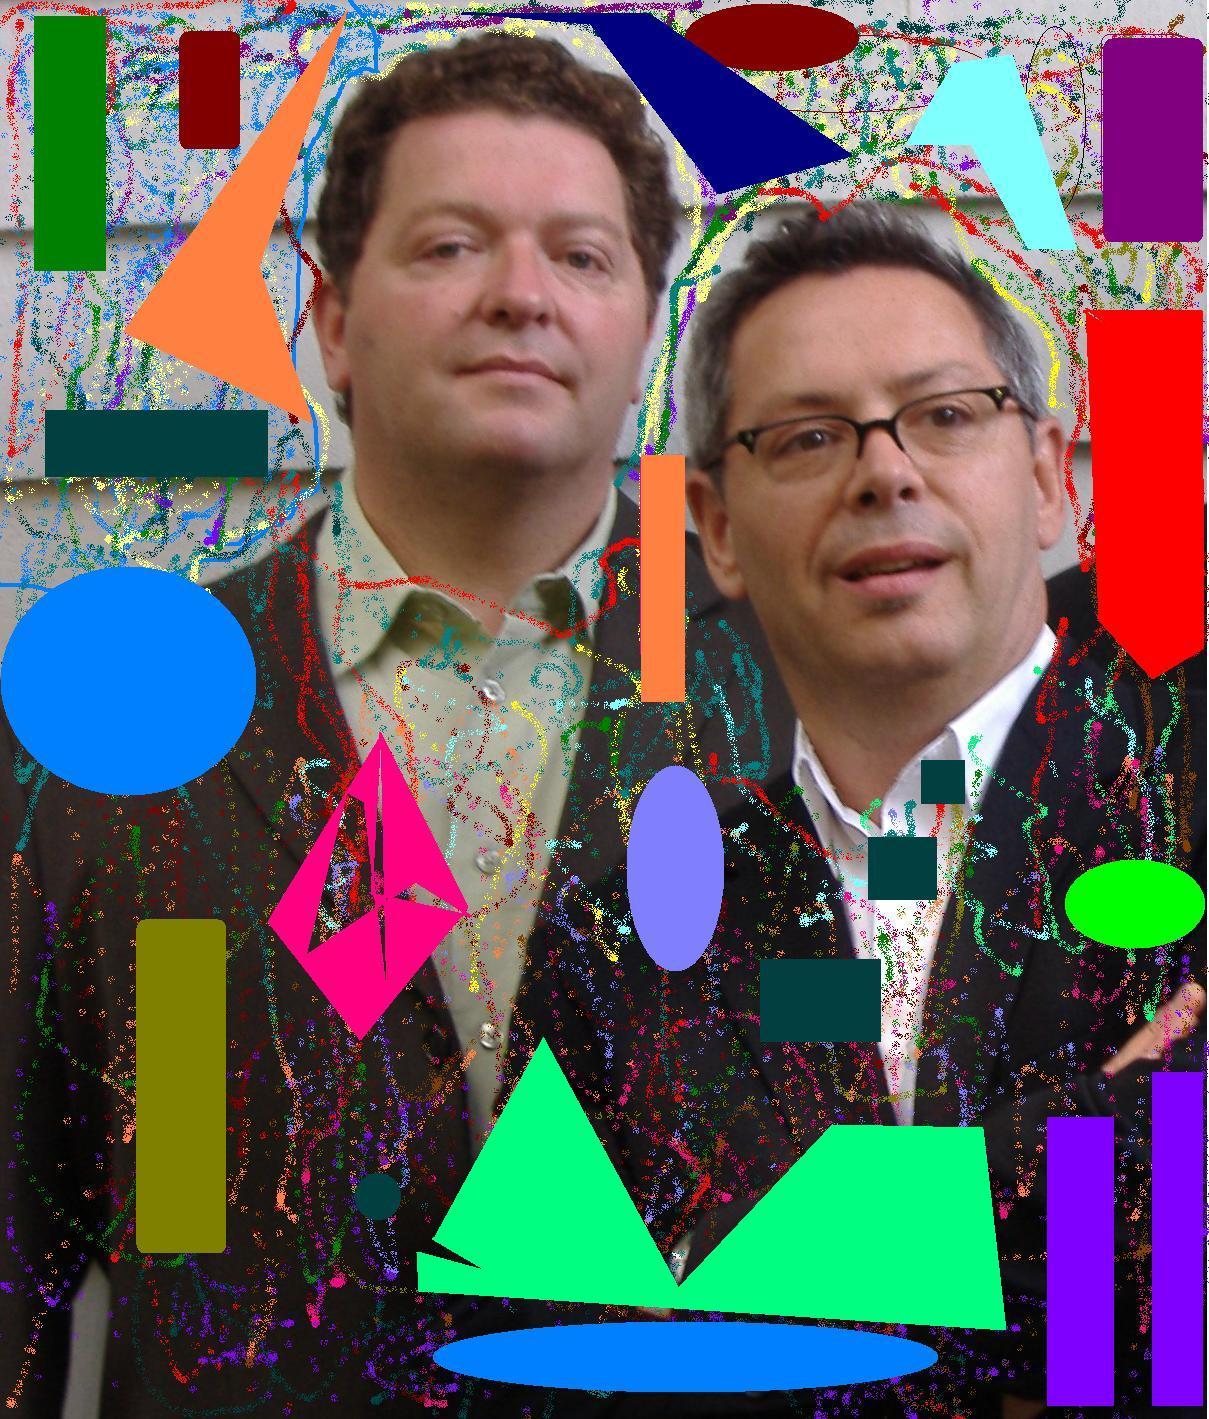 Acker Brothers Promo II